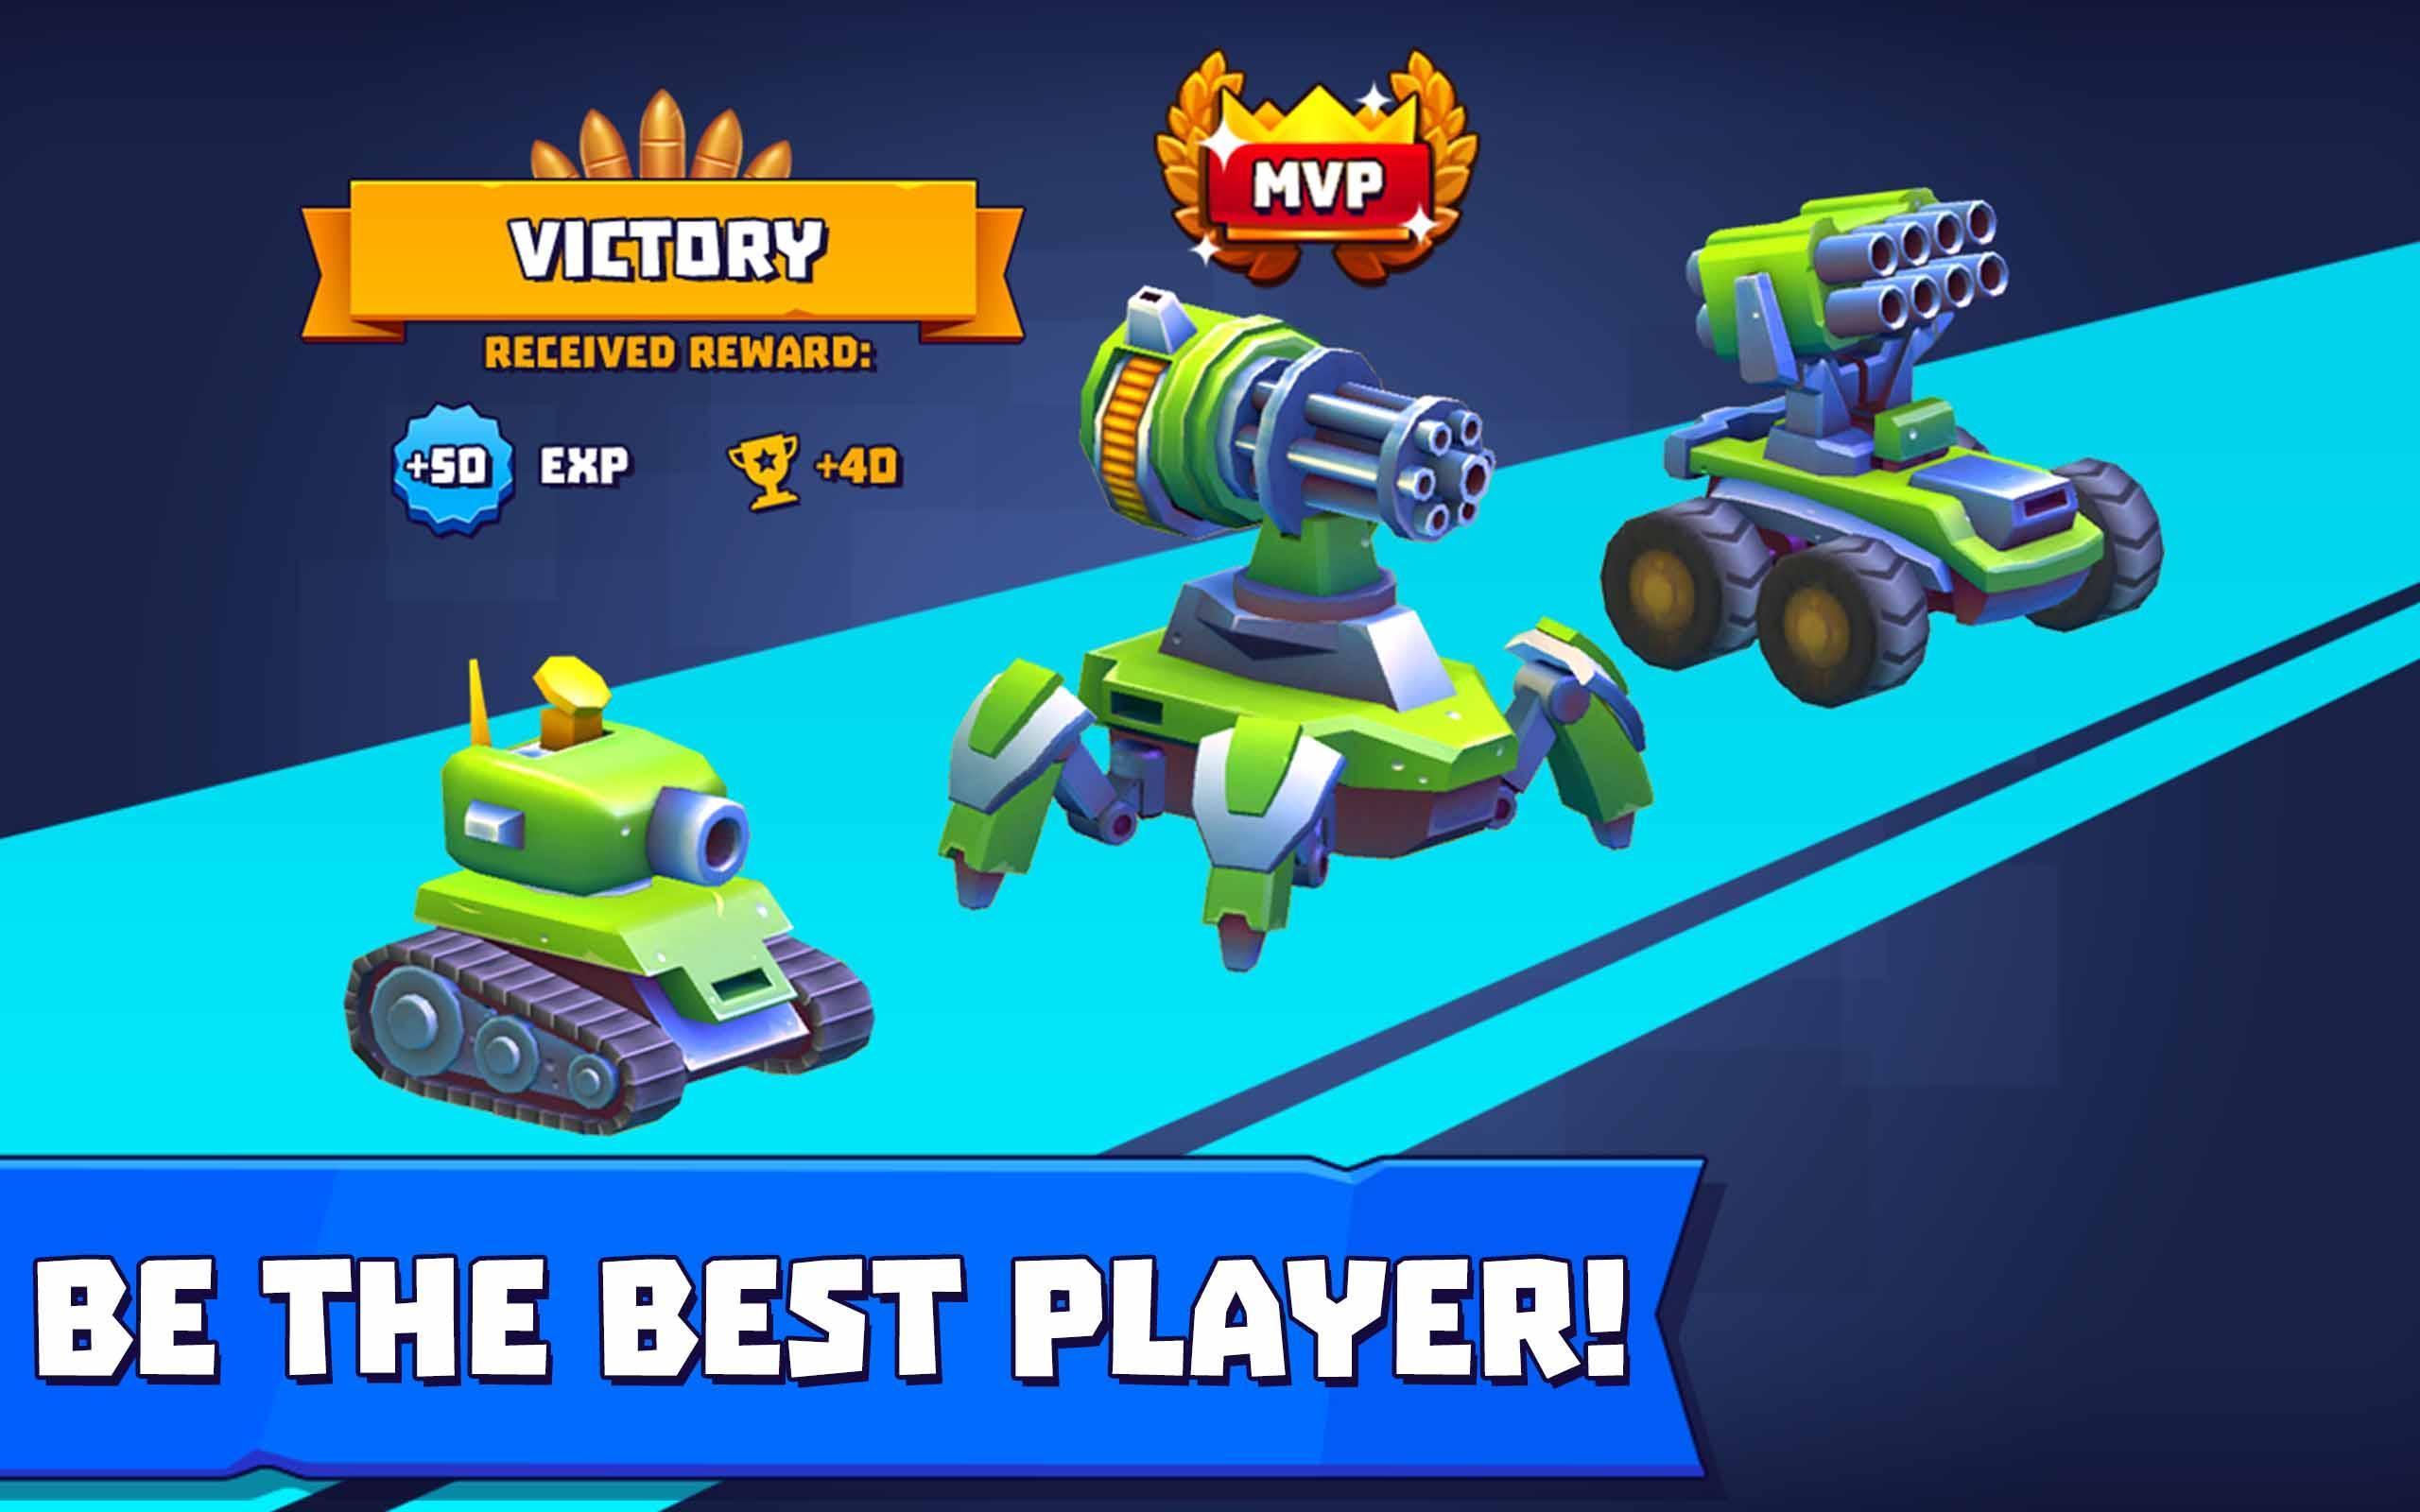 Tanks A Lot! - Realtime Multiplayer Battle Arena 2.56 Screenshot 13